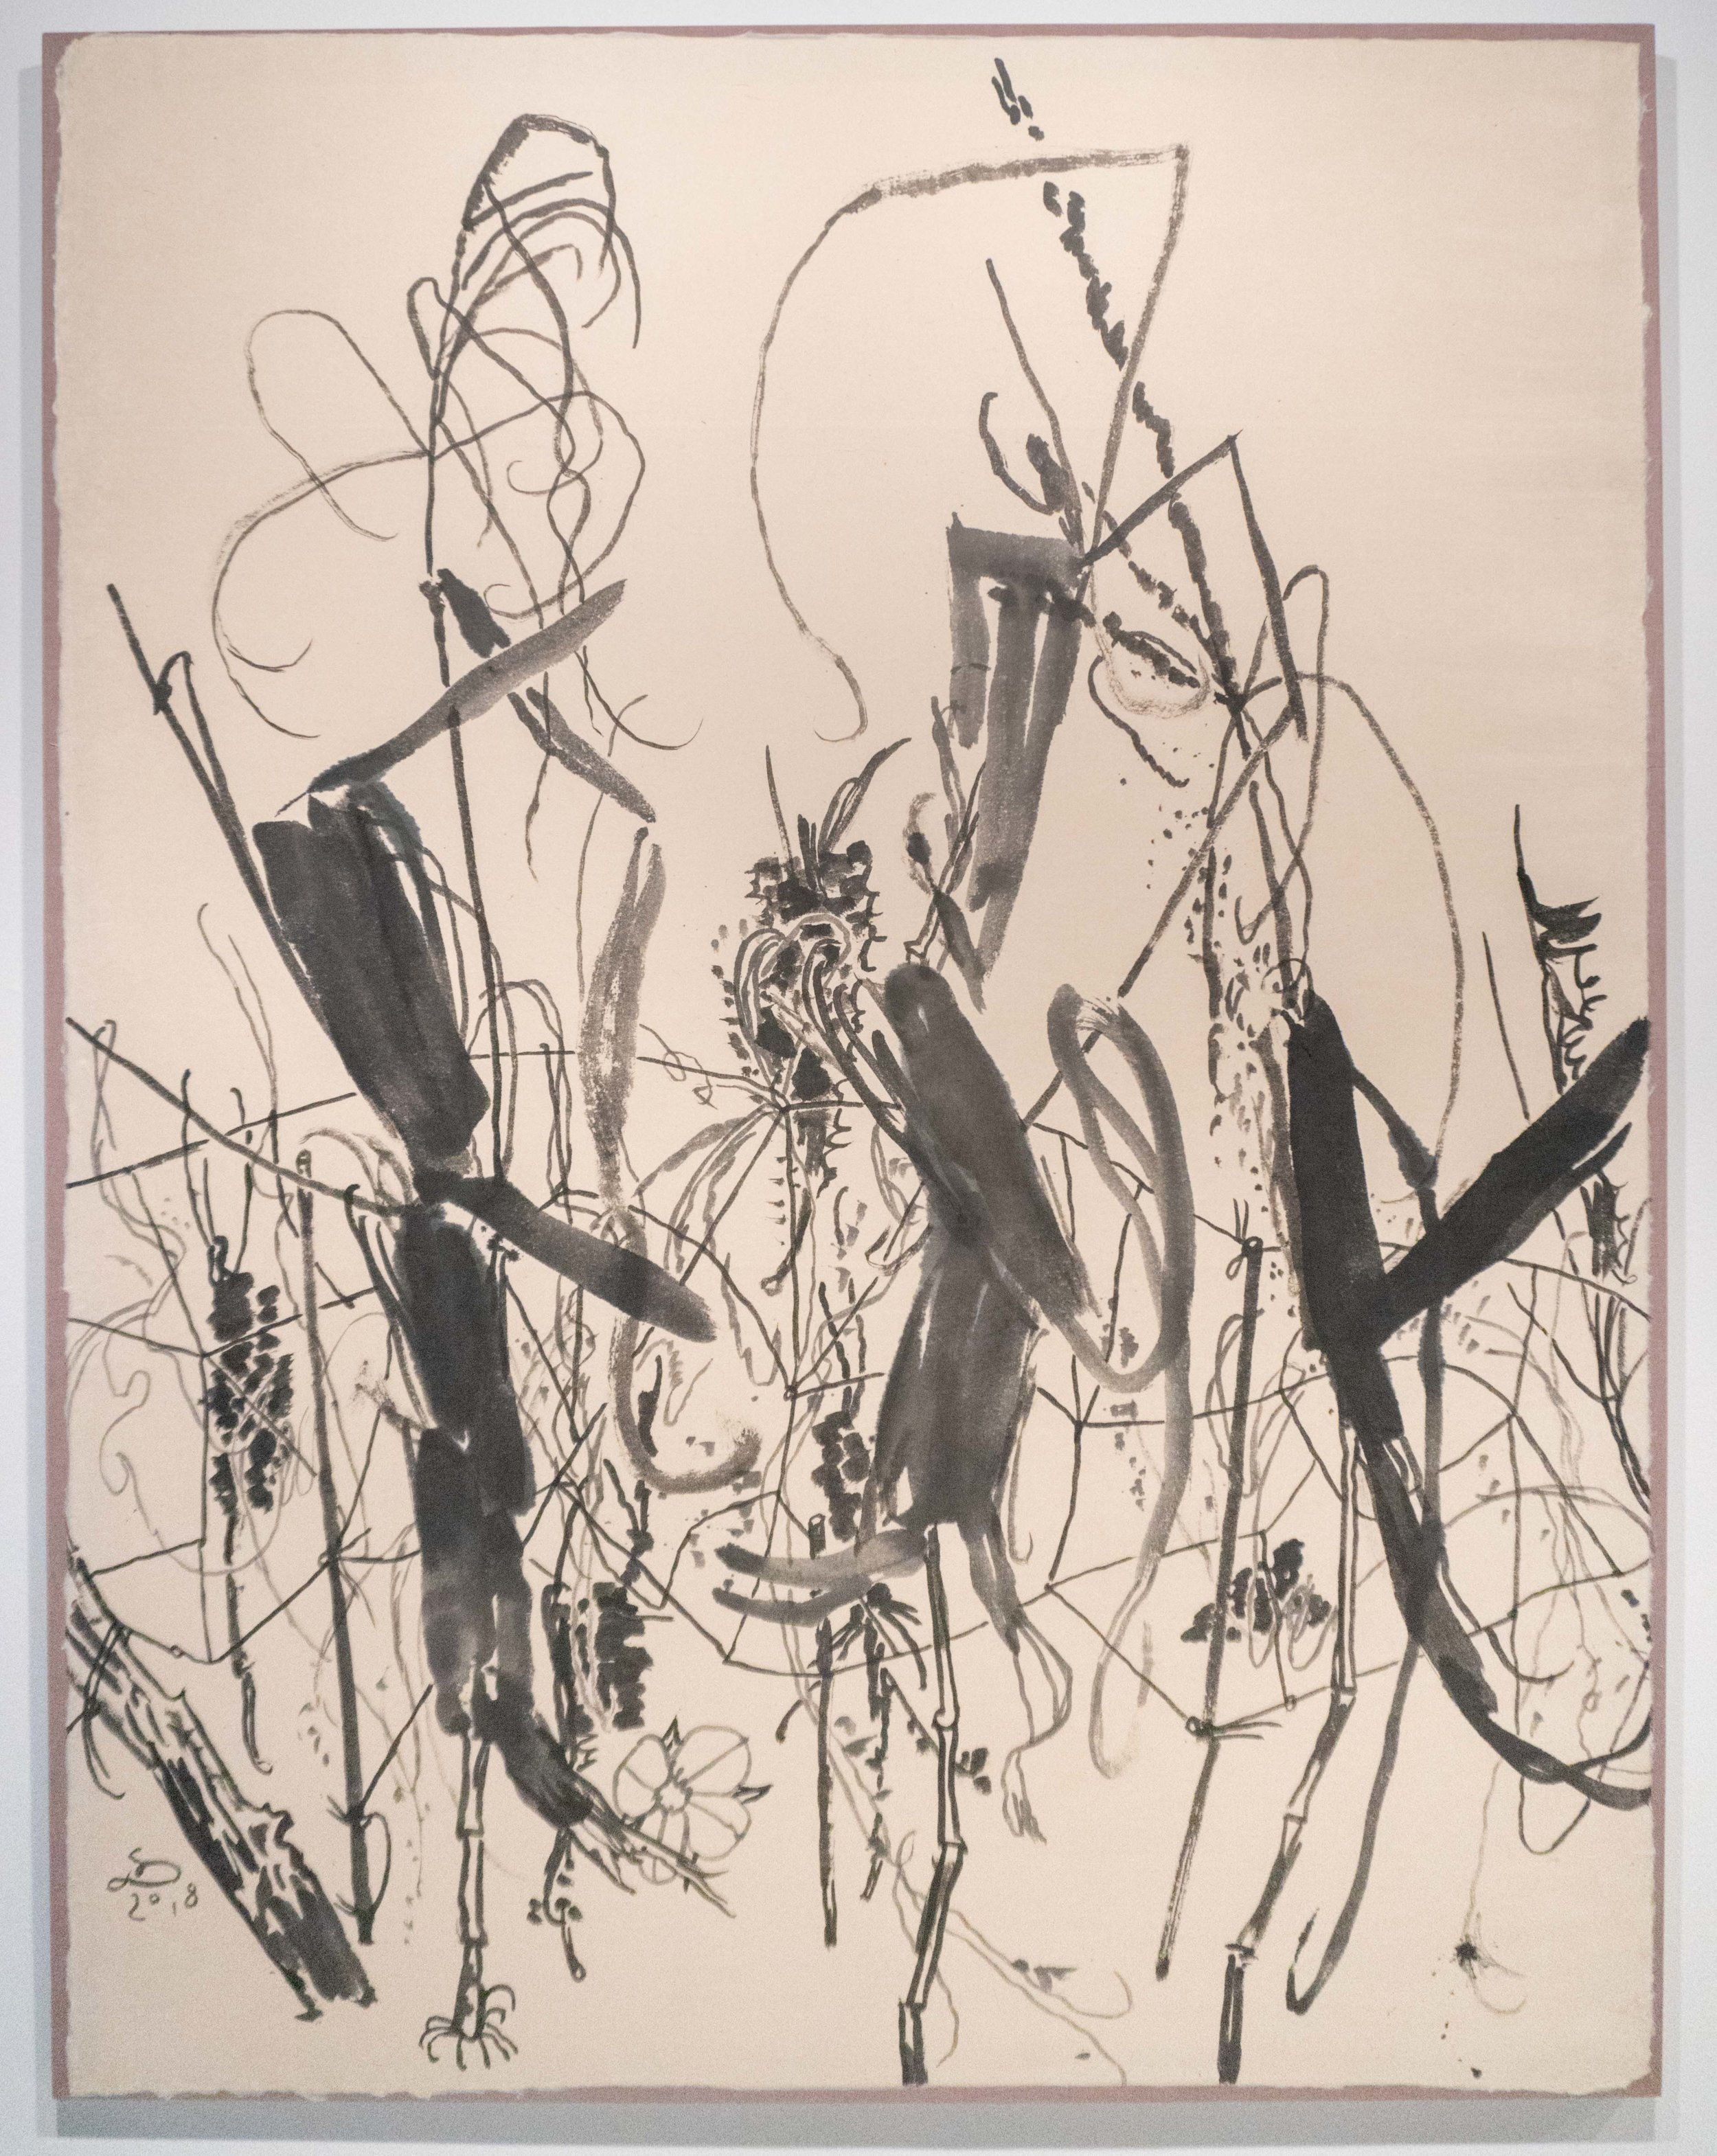 Kim Sun Doo 김선두 b. 1958   Great Celandine애기 똥풀 2018 Ink on Jangji paper 54 ⅜ x 70 ⅞ in